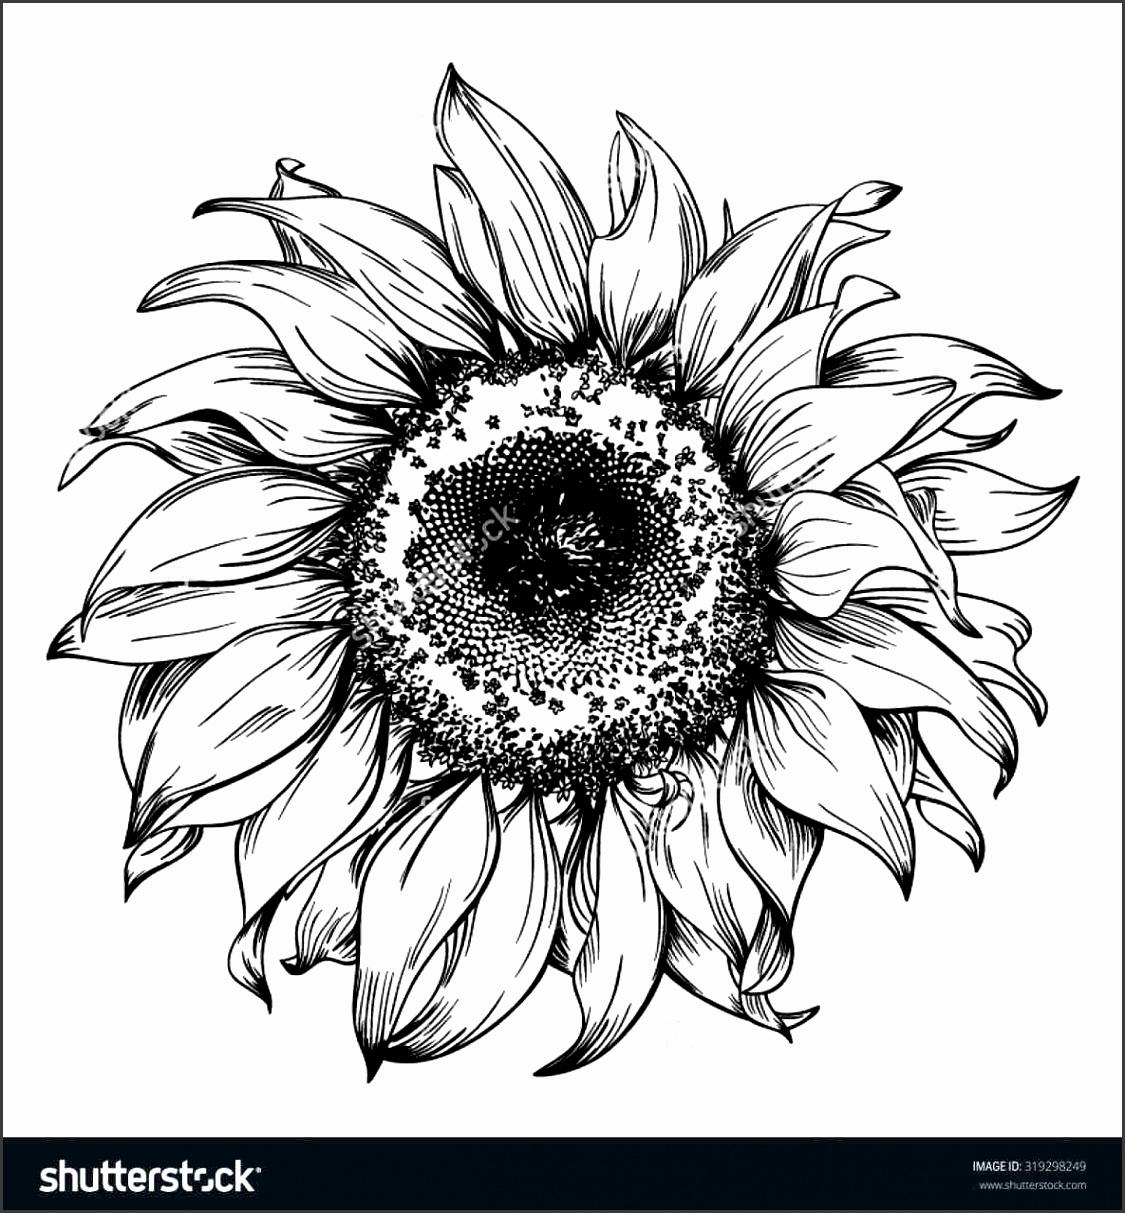 7 Sunflower Black and White Template - SampleTemplatess ...